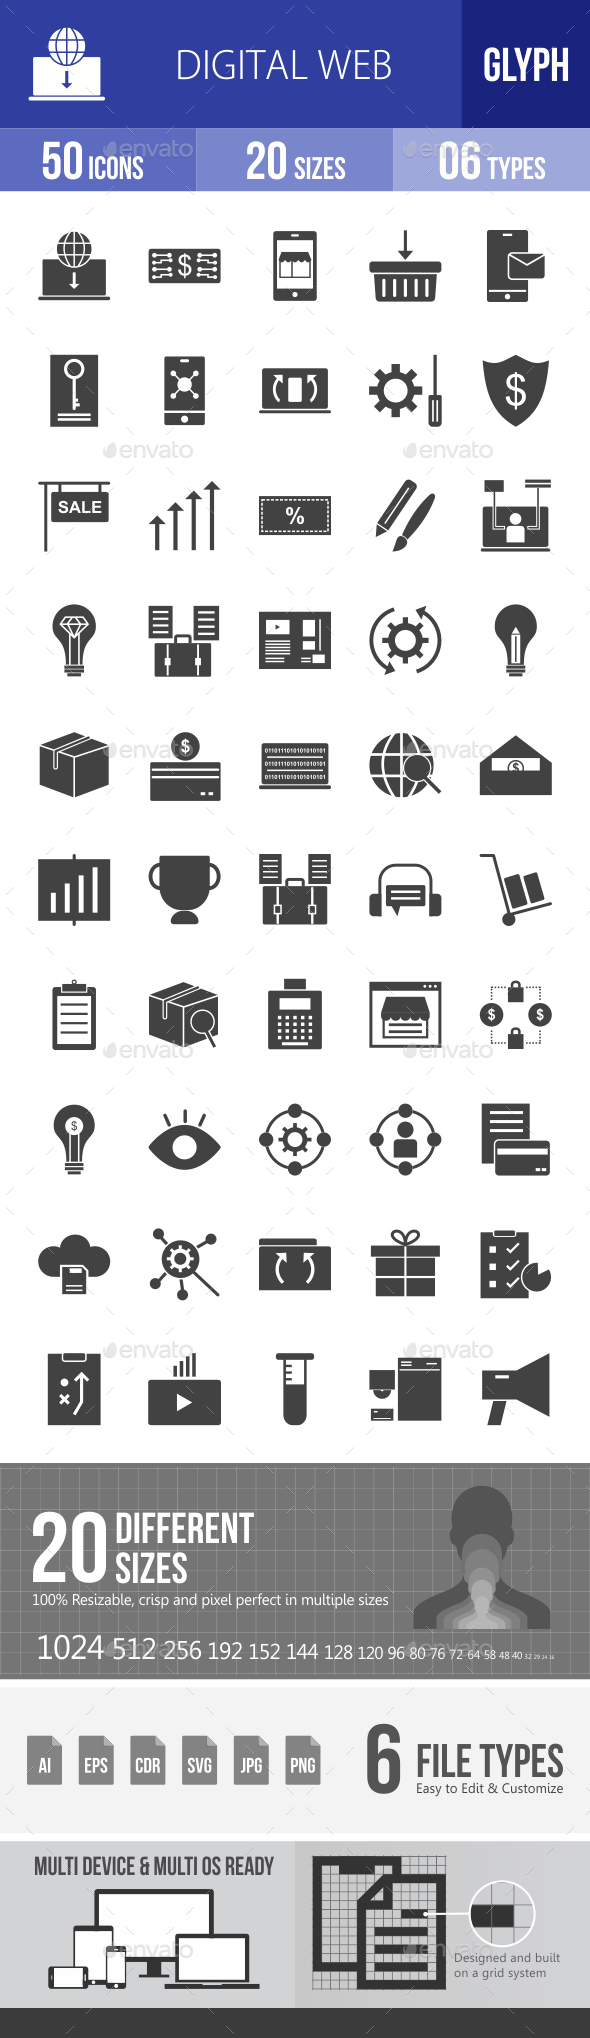 Digital Web Glyph Icons - Icons